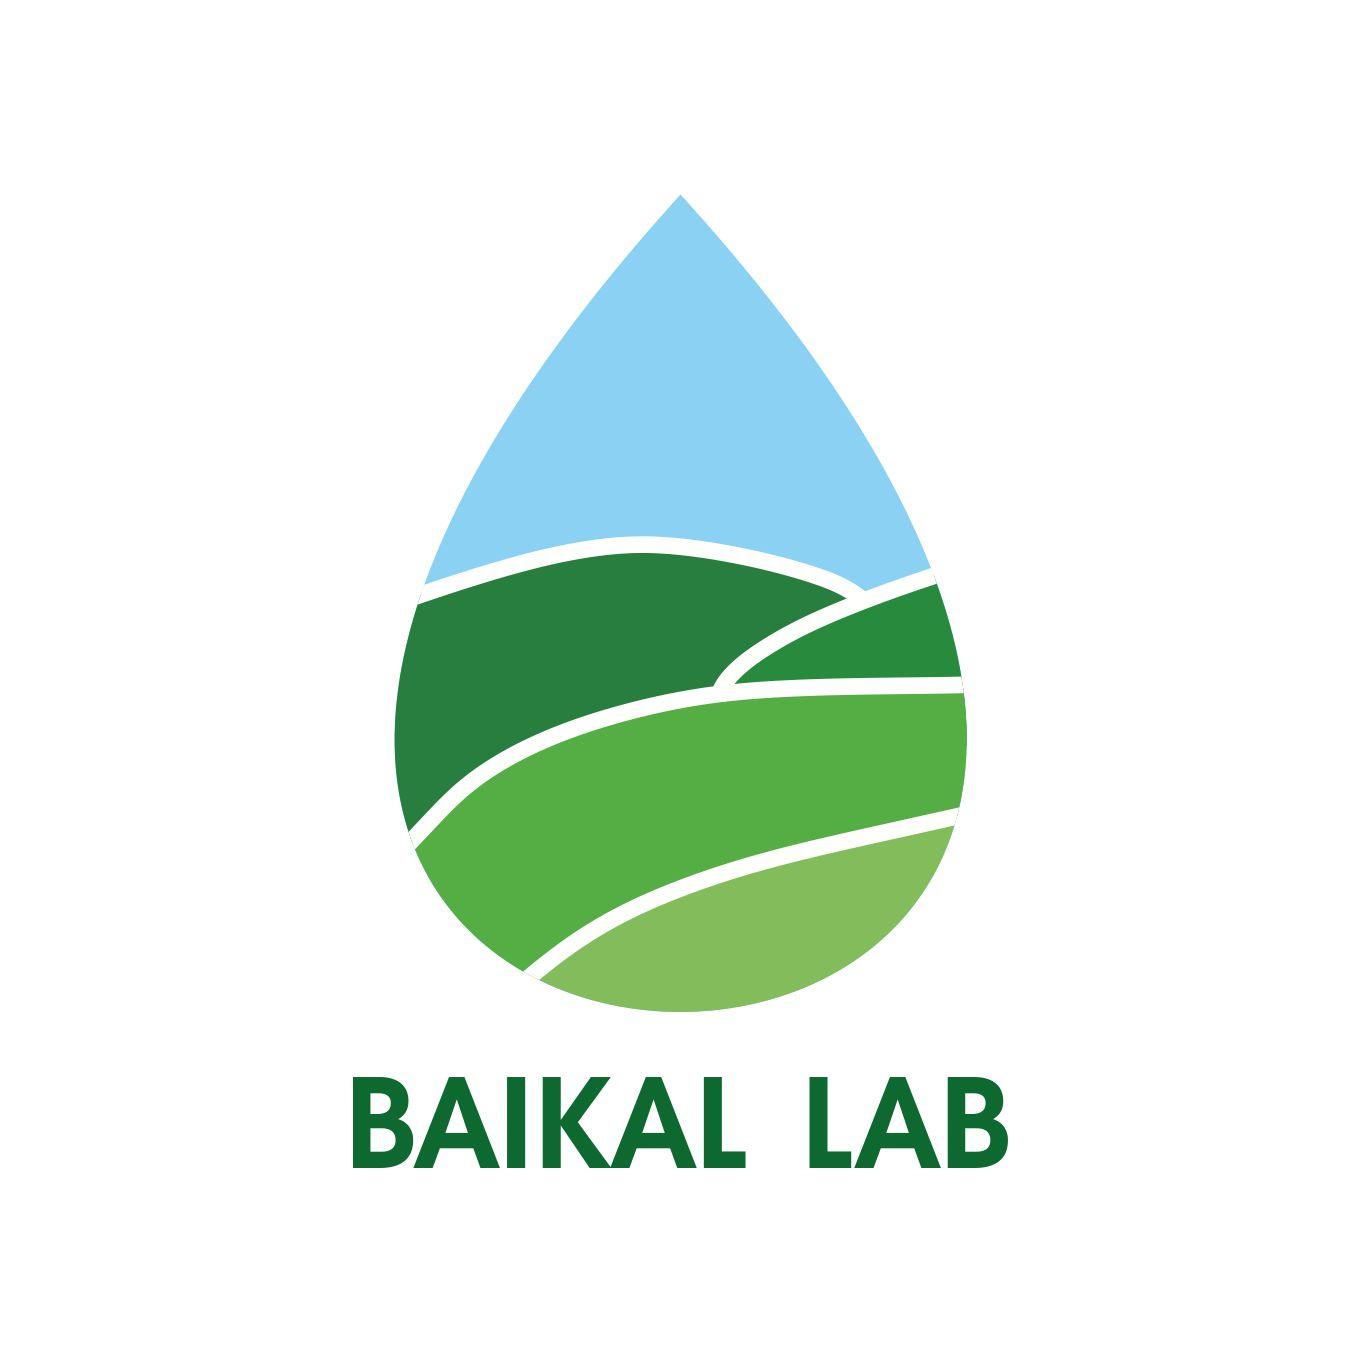 Разработка логотипа торговой марки фото f_813596b1f9ec03c1.jpg